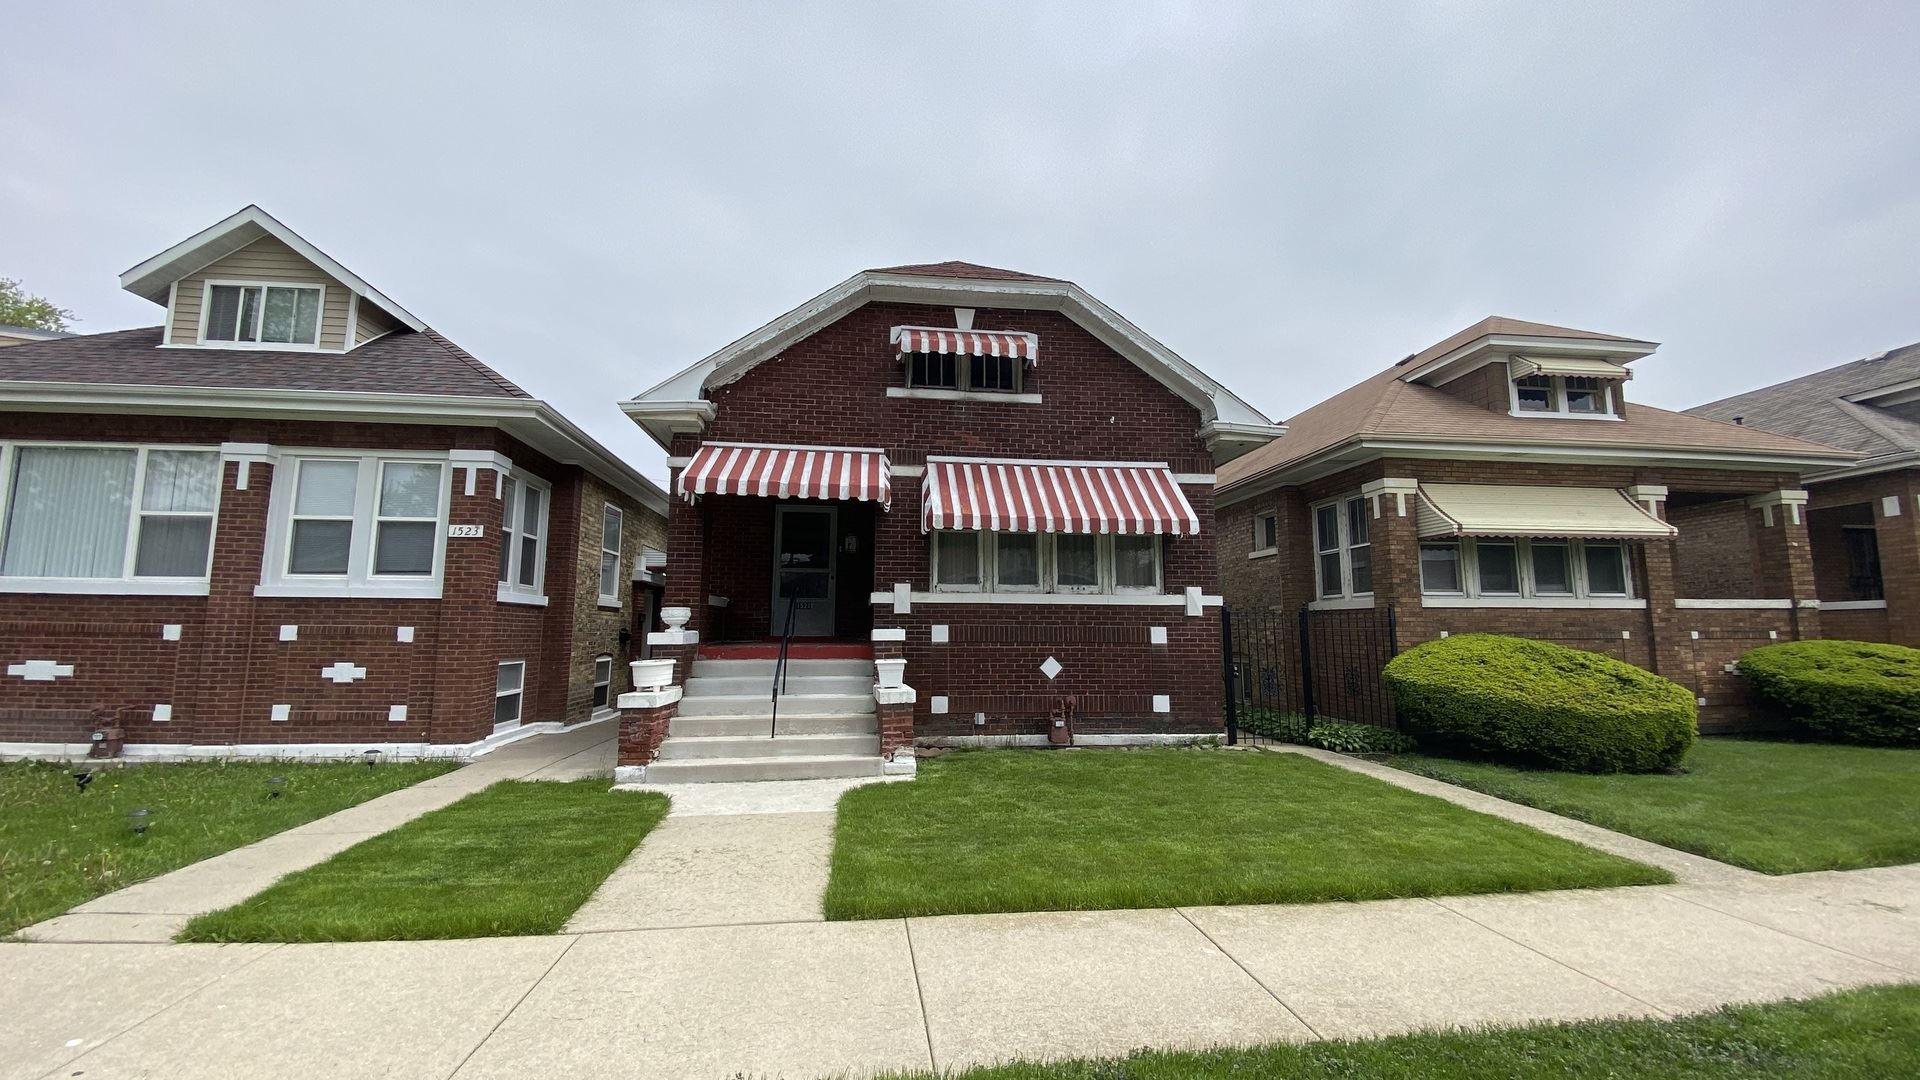 1521 N Monitor Avenue, Chicago, IL 60651 - MLS#: 10751191